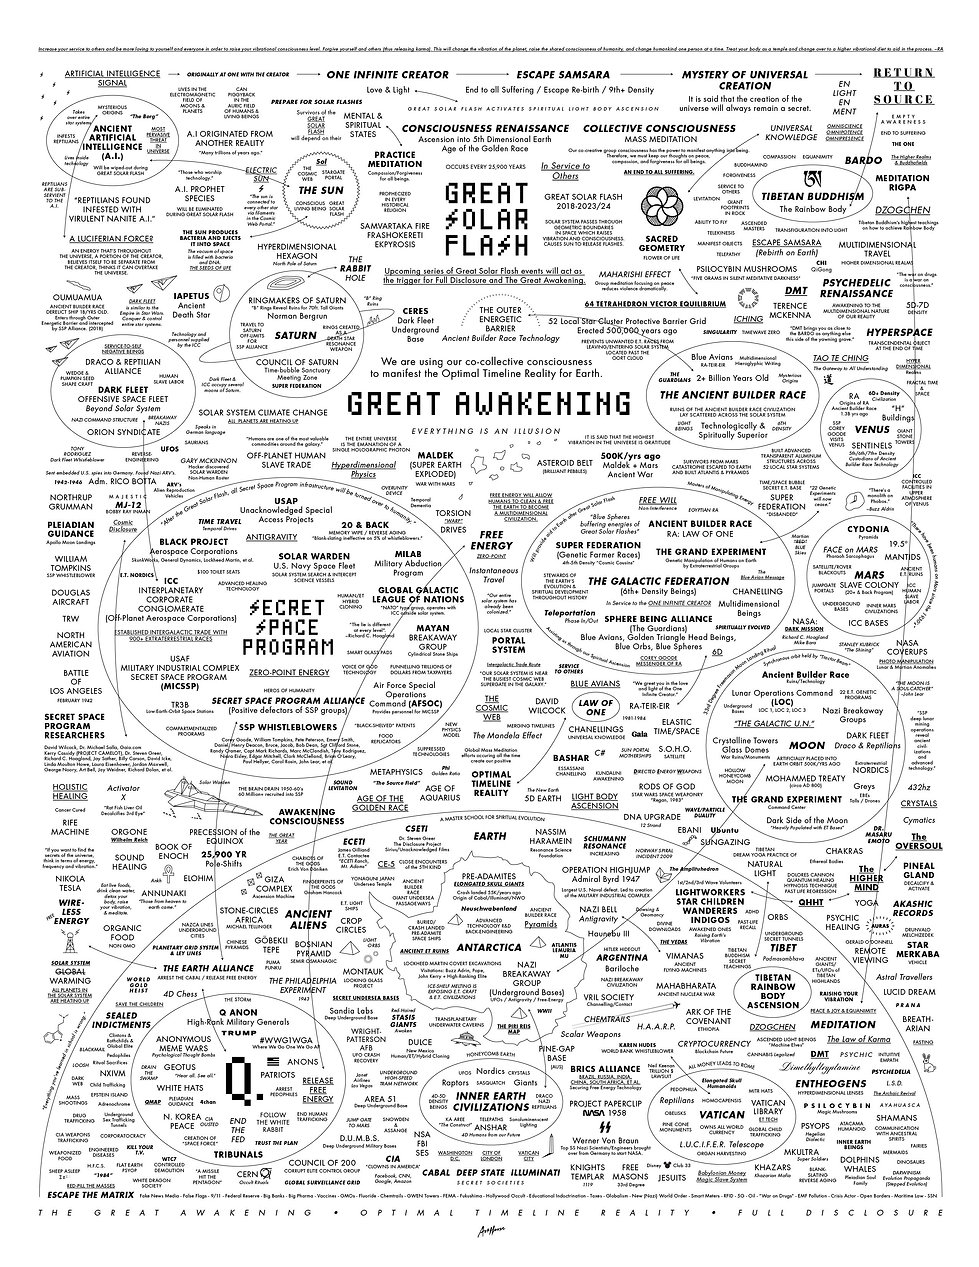 GreatAwakeningMap.jpg